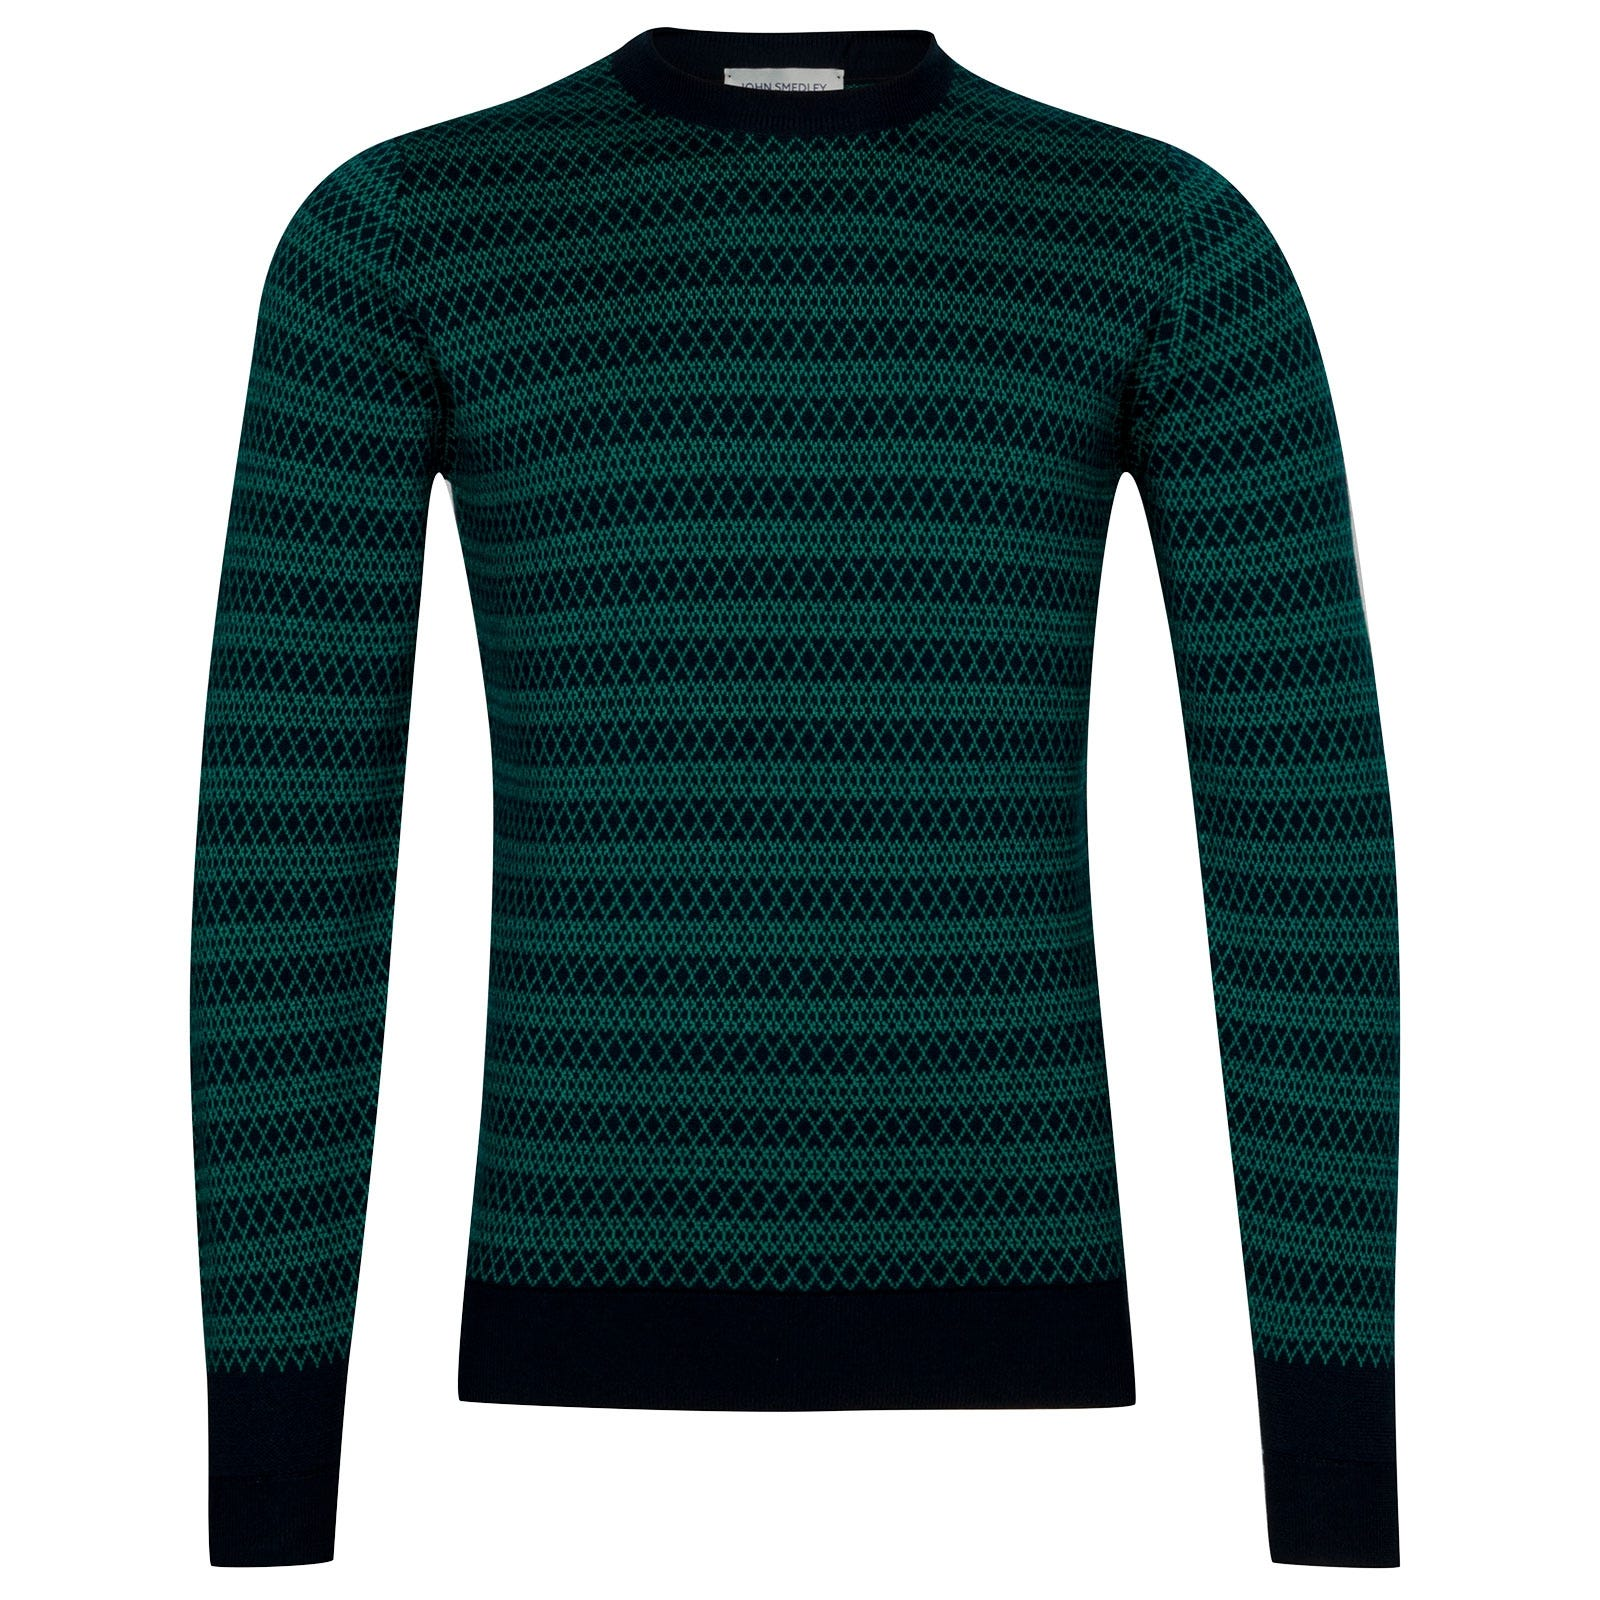 John Smedley Baldo Extra Fine Merino Wool Pullover in Orion Green-XL